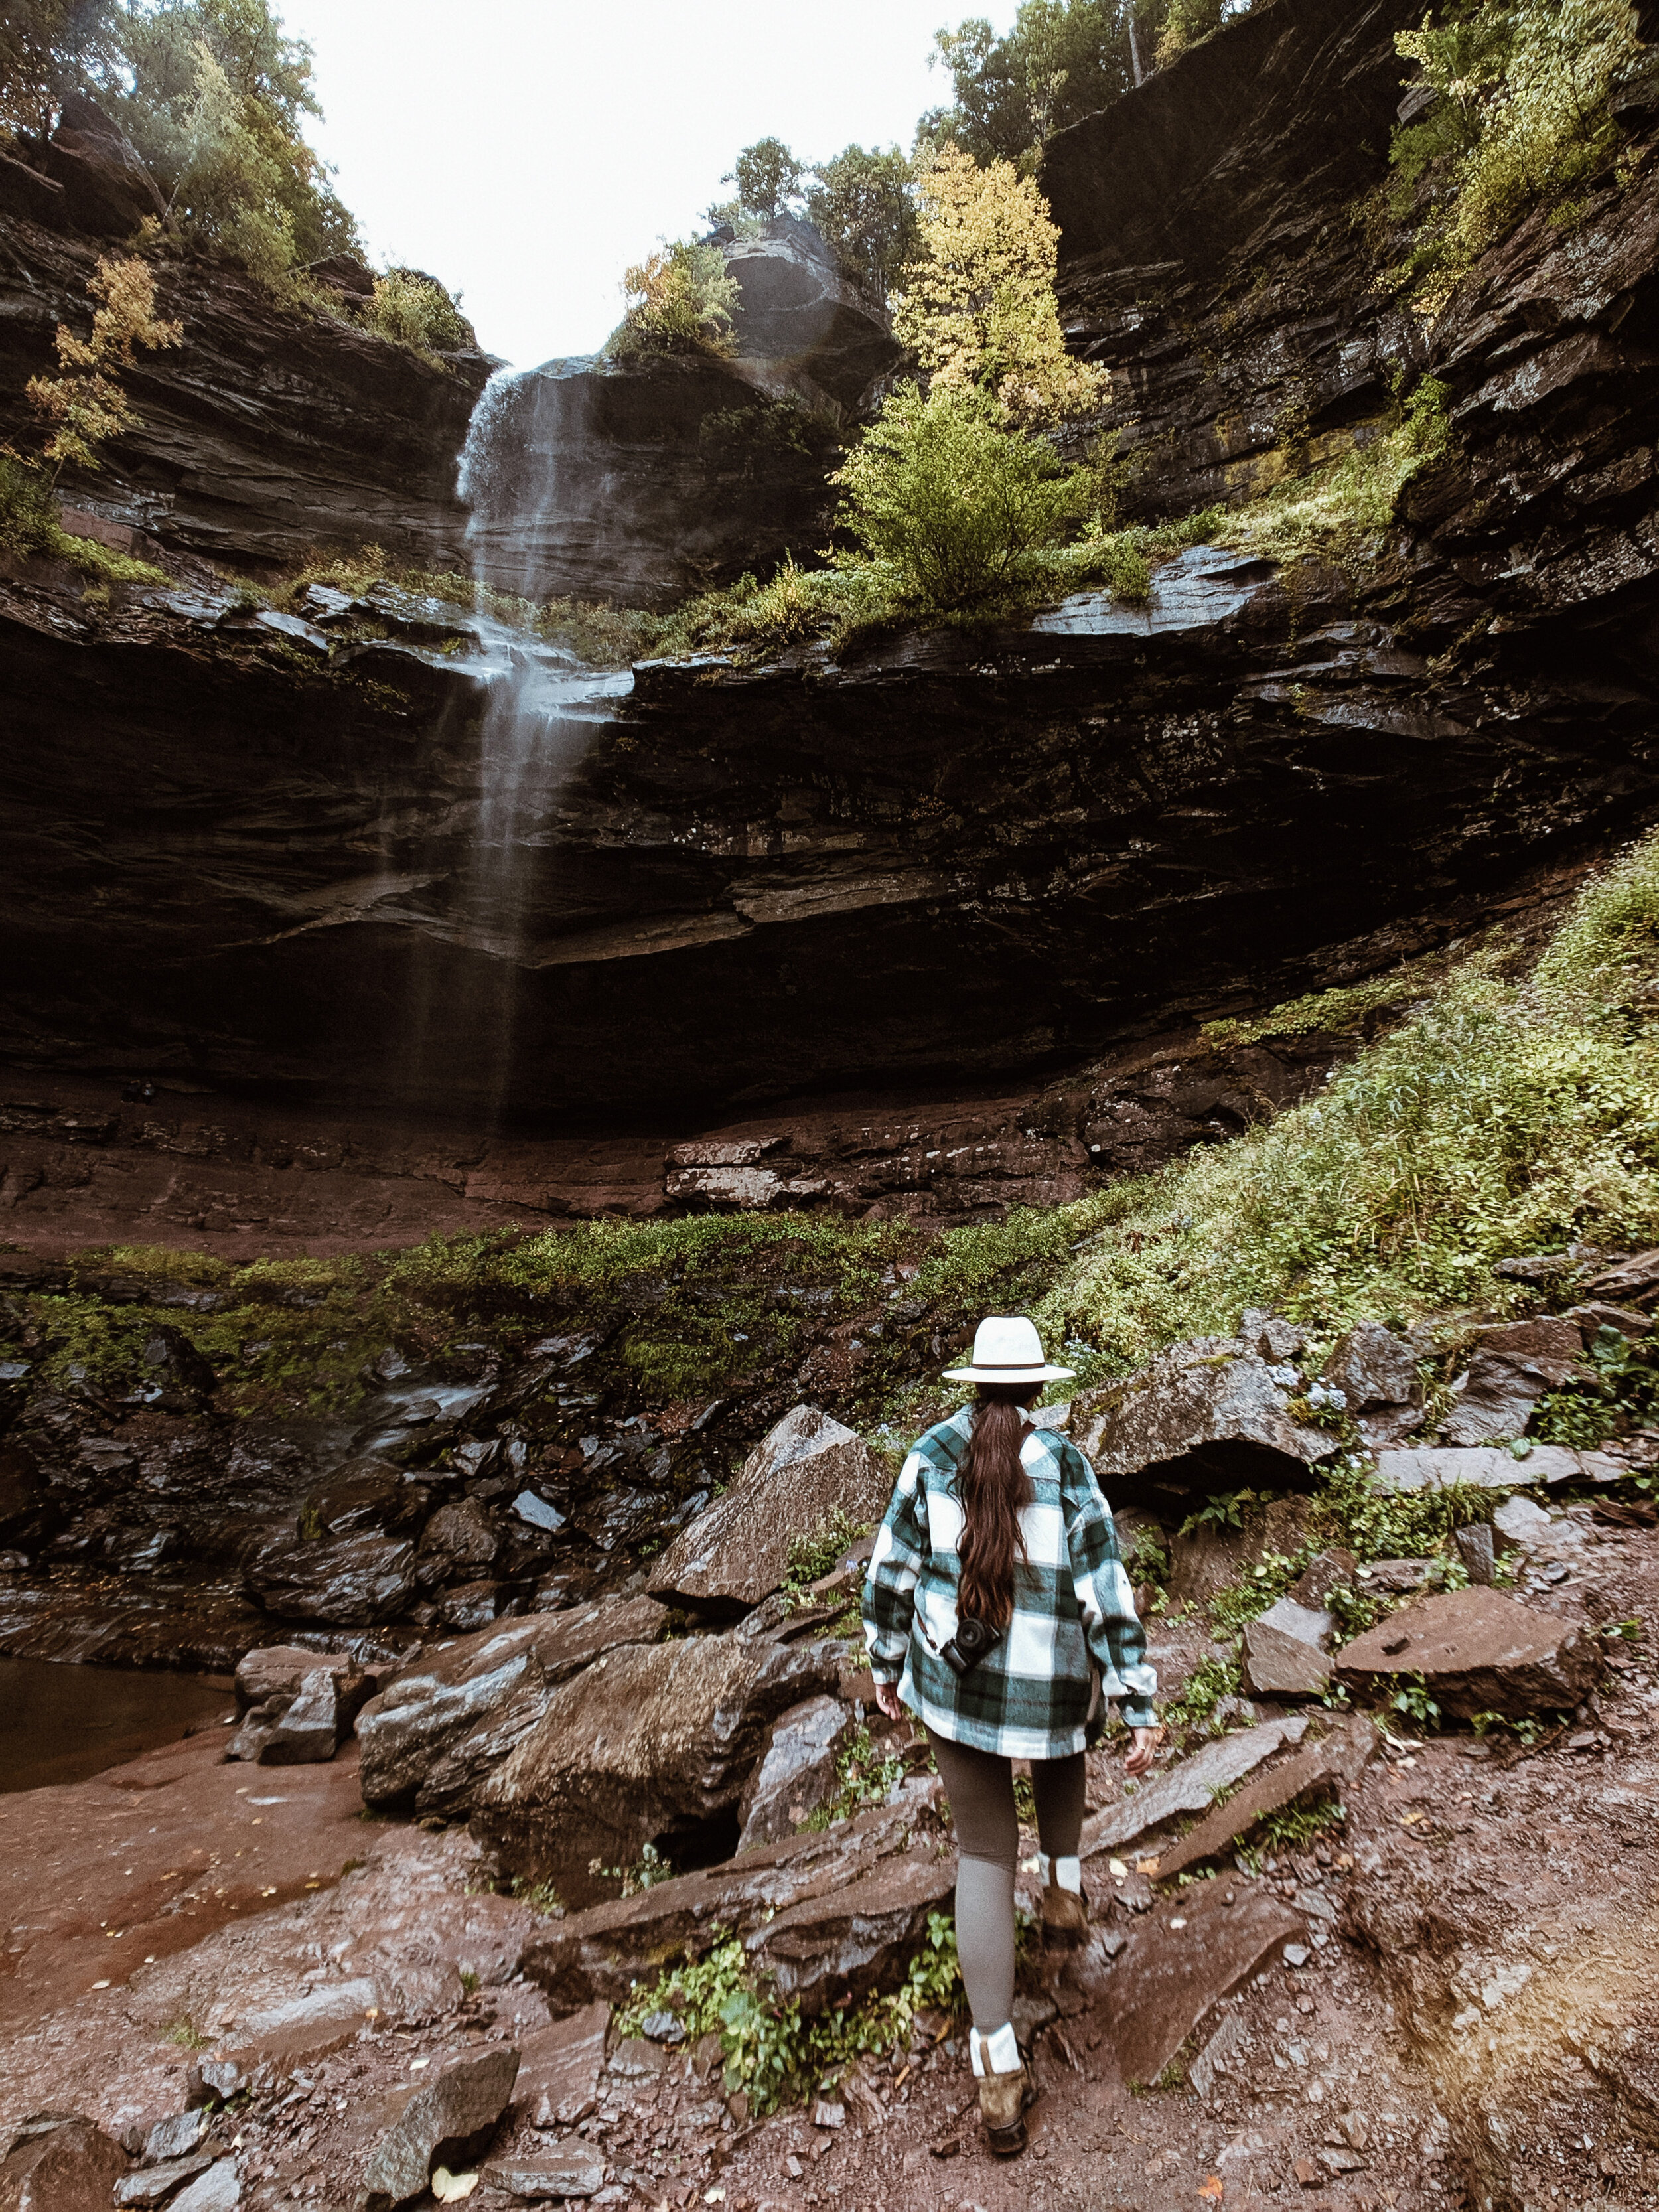 Always Looking For The Magic - Nicole Toland - Catskills NY